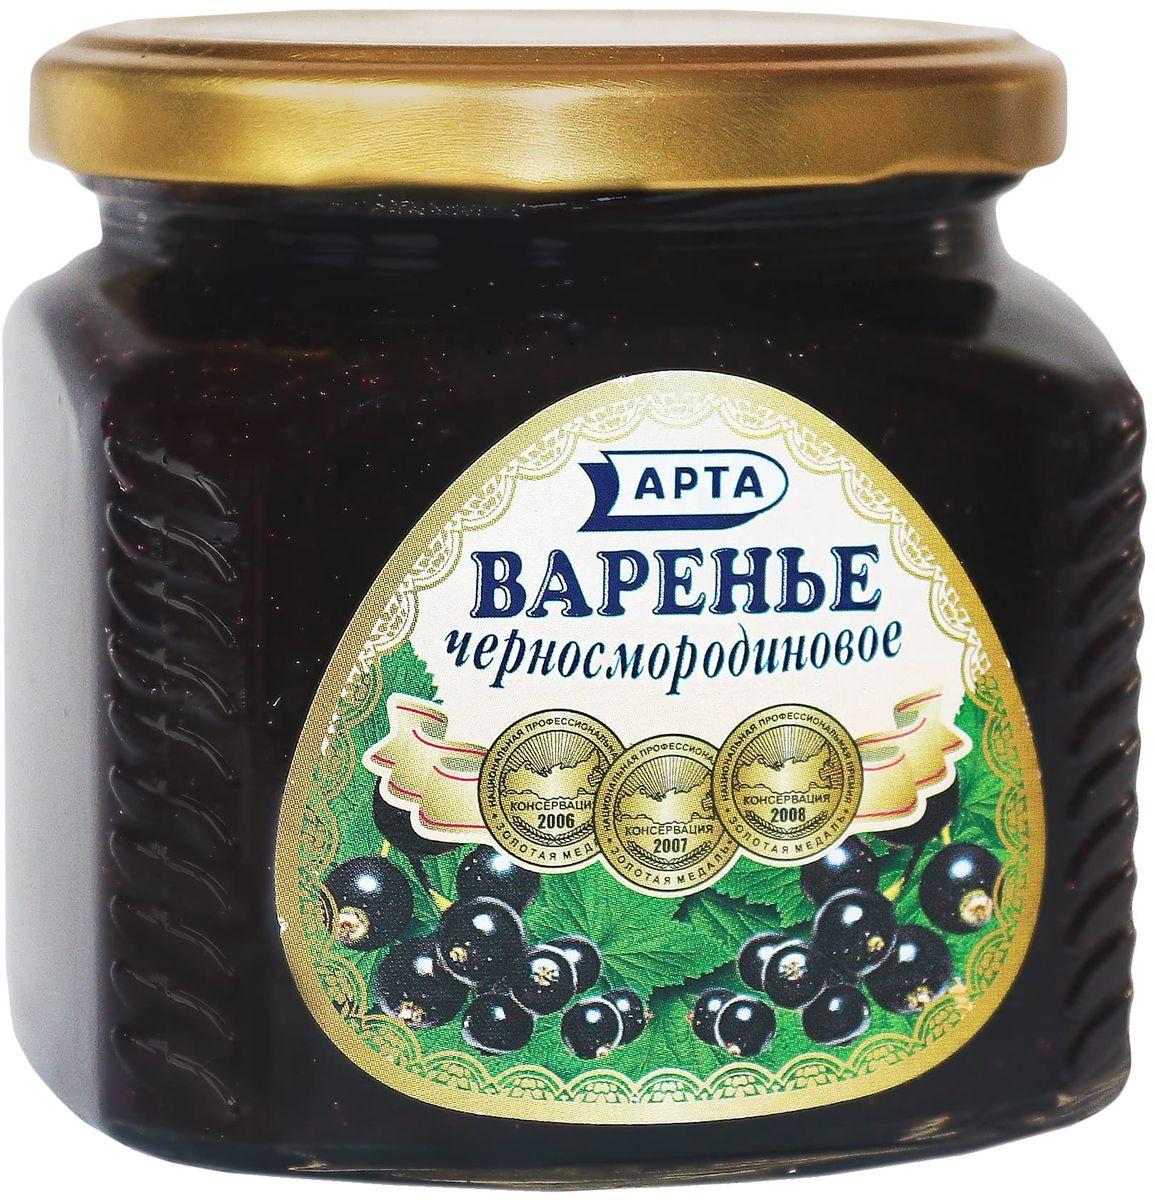 Арта варенье черносмородиновое, 500 г арта варенье черносмородиновое 500 г